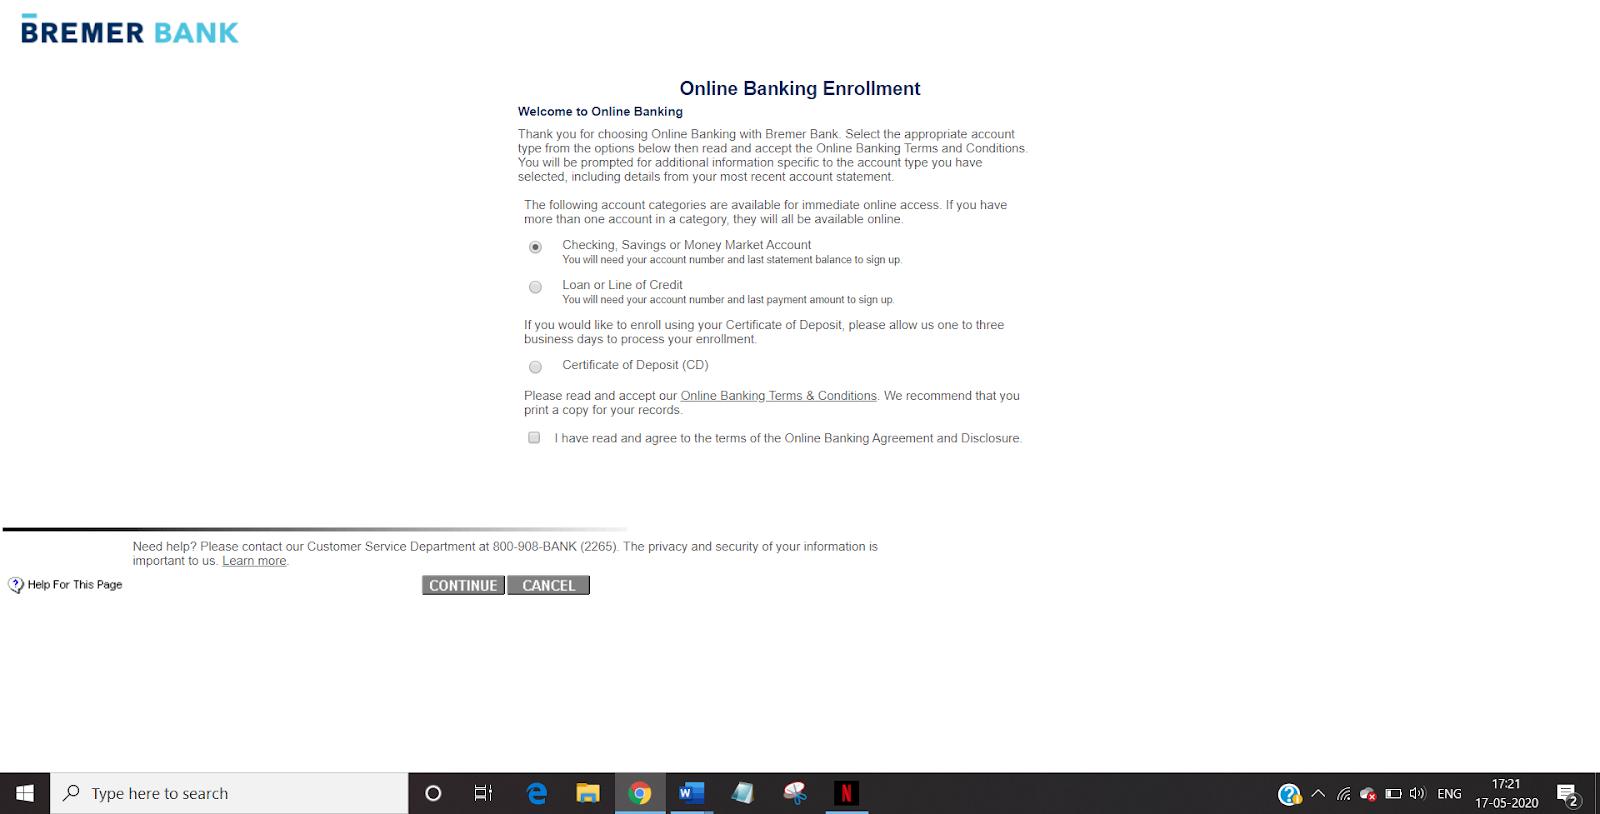 BREMER BANK ONLINE BANKING LOGIN